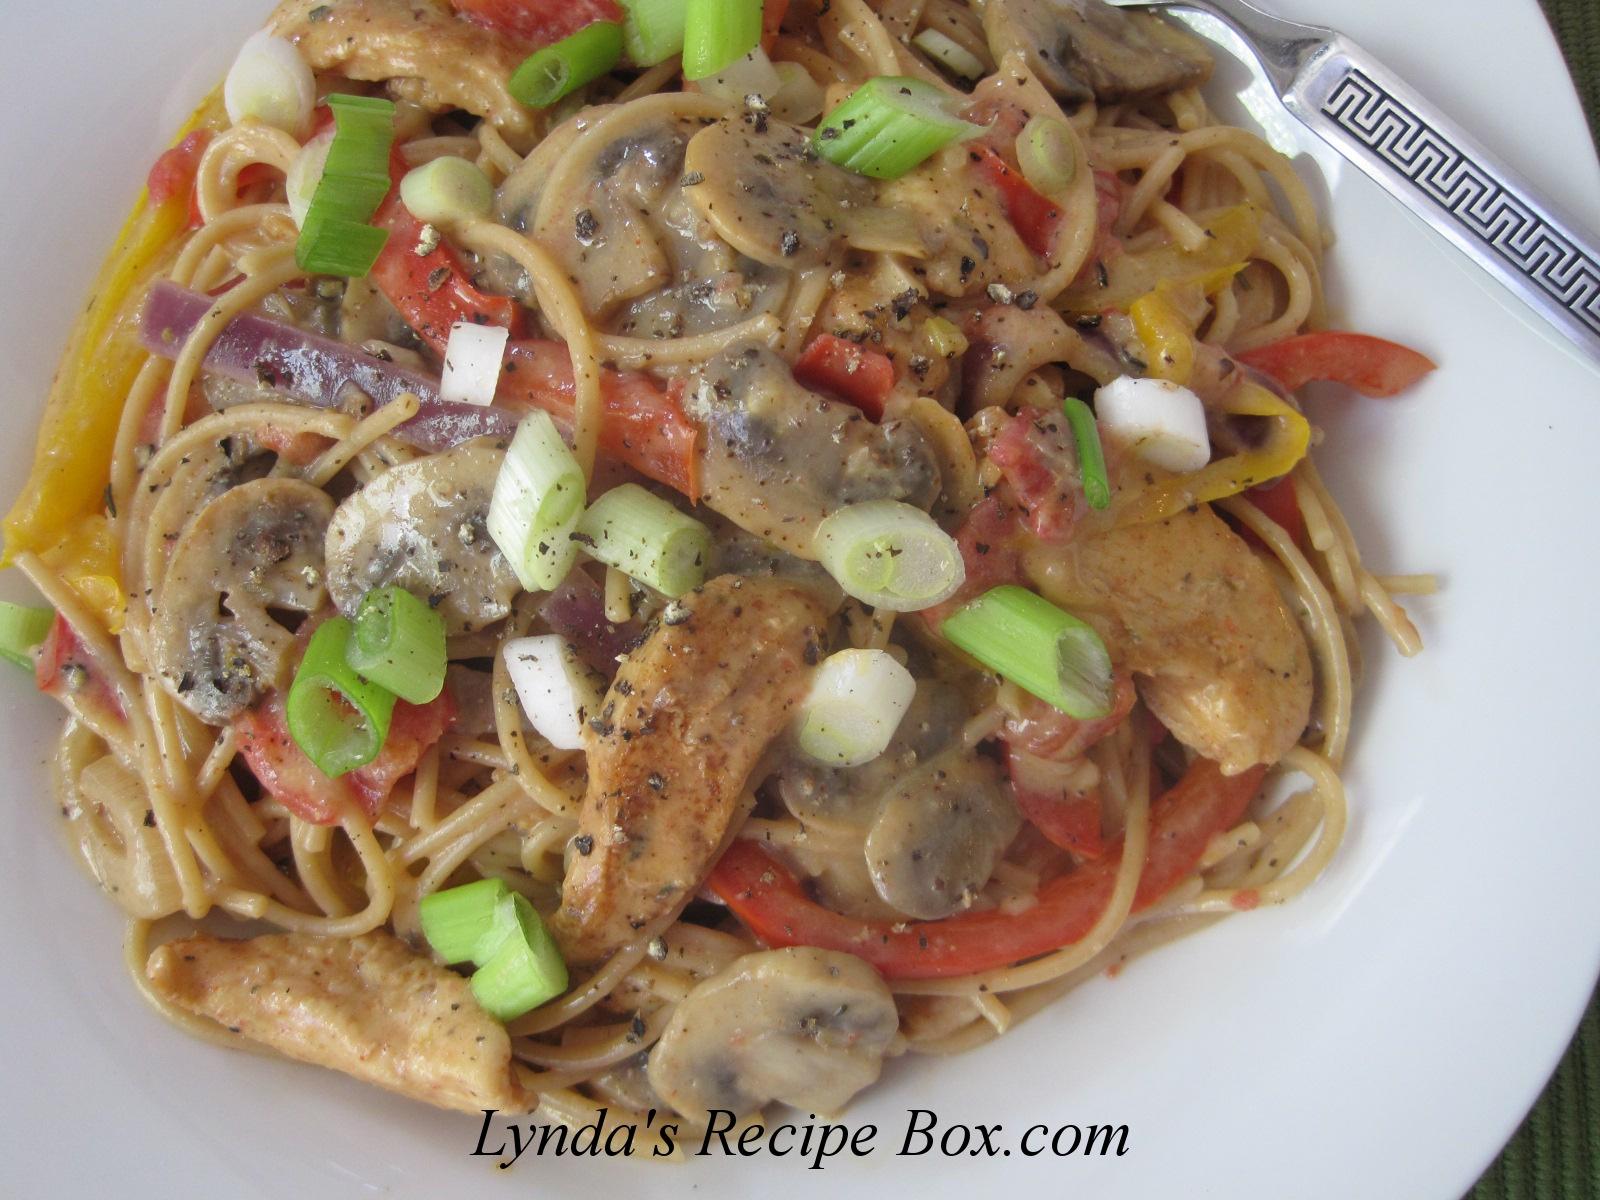 Lynda's Recipe Box: Cajun Chicken Pasta - On the Lighter Side